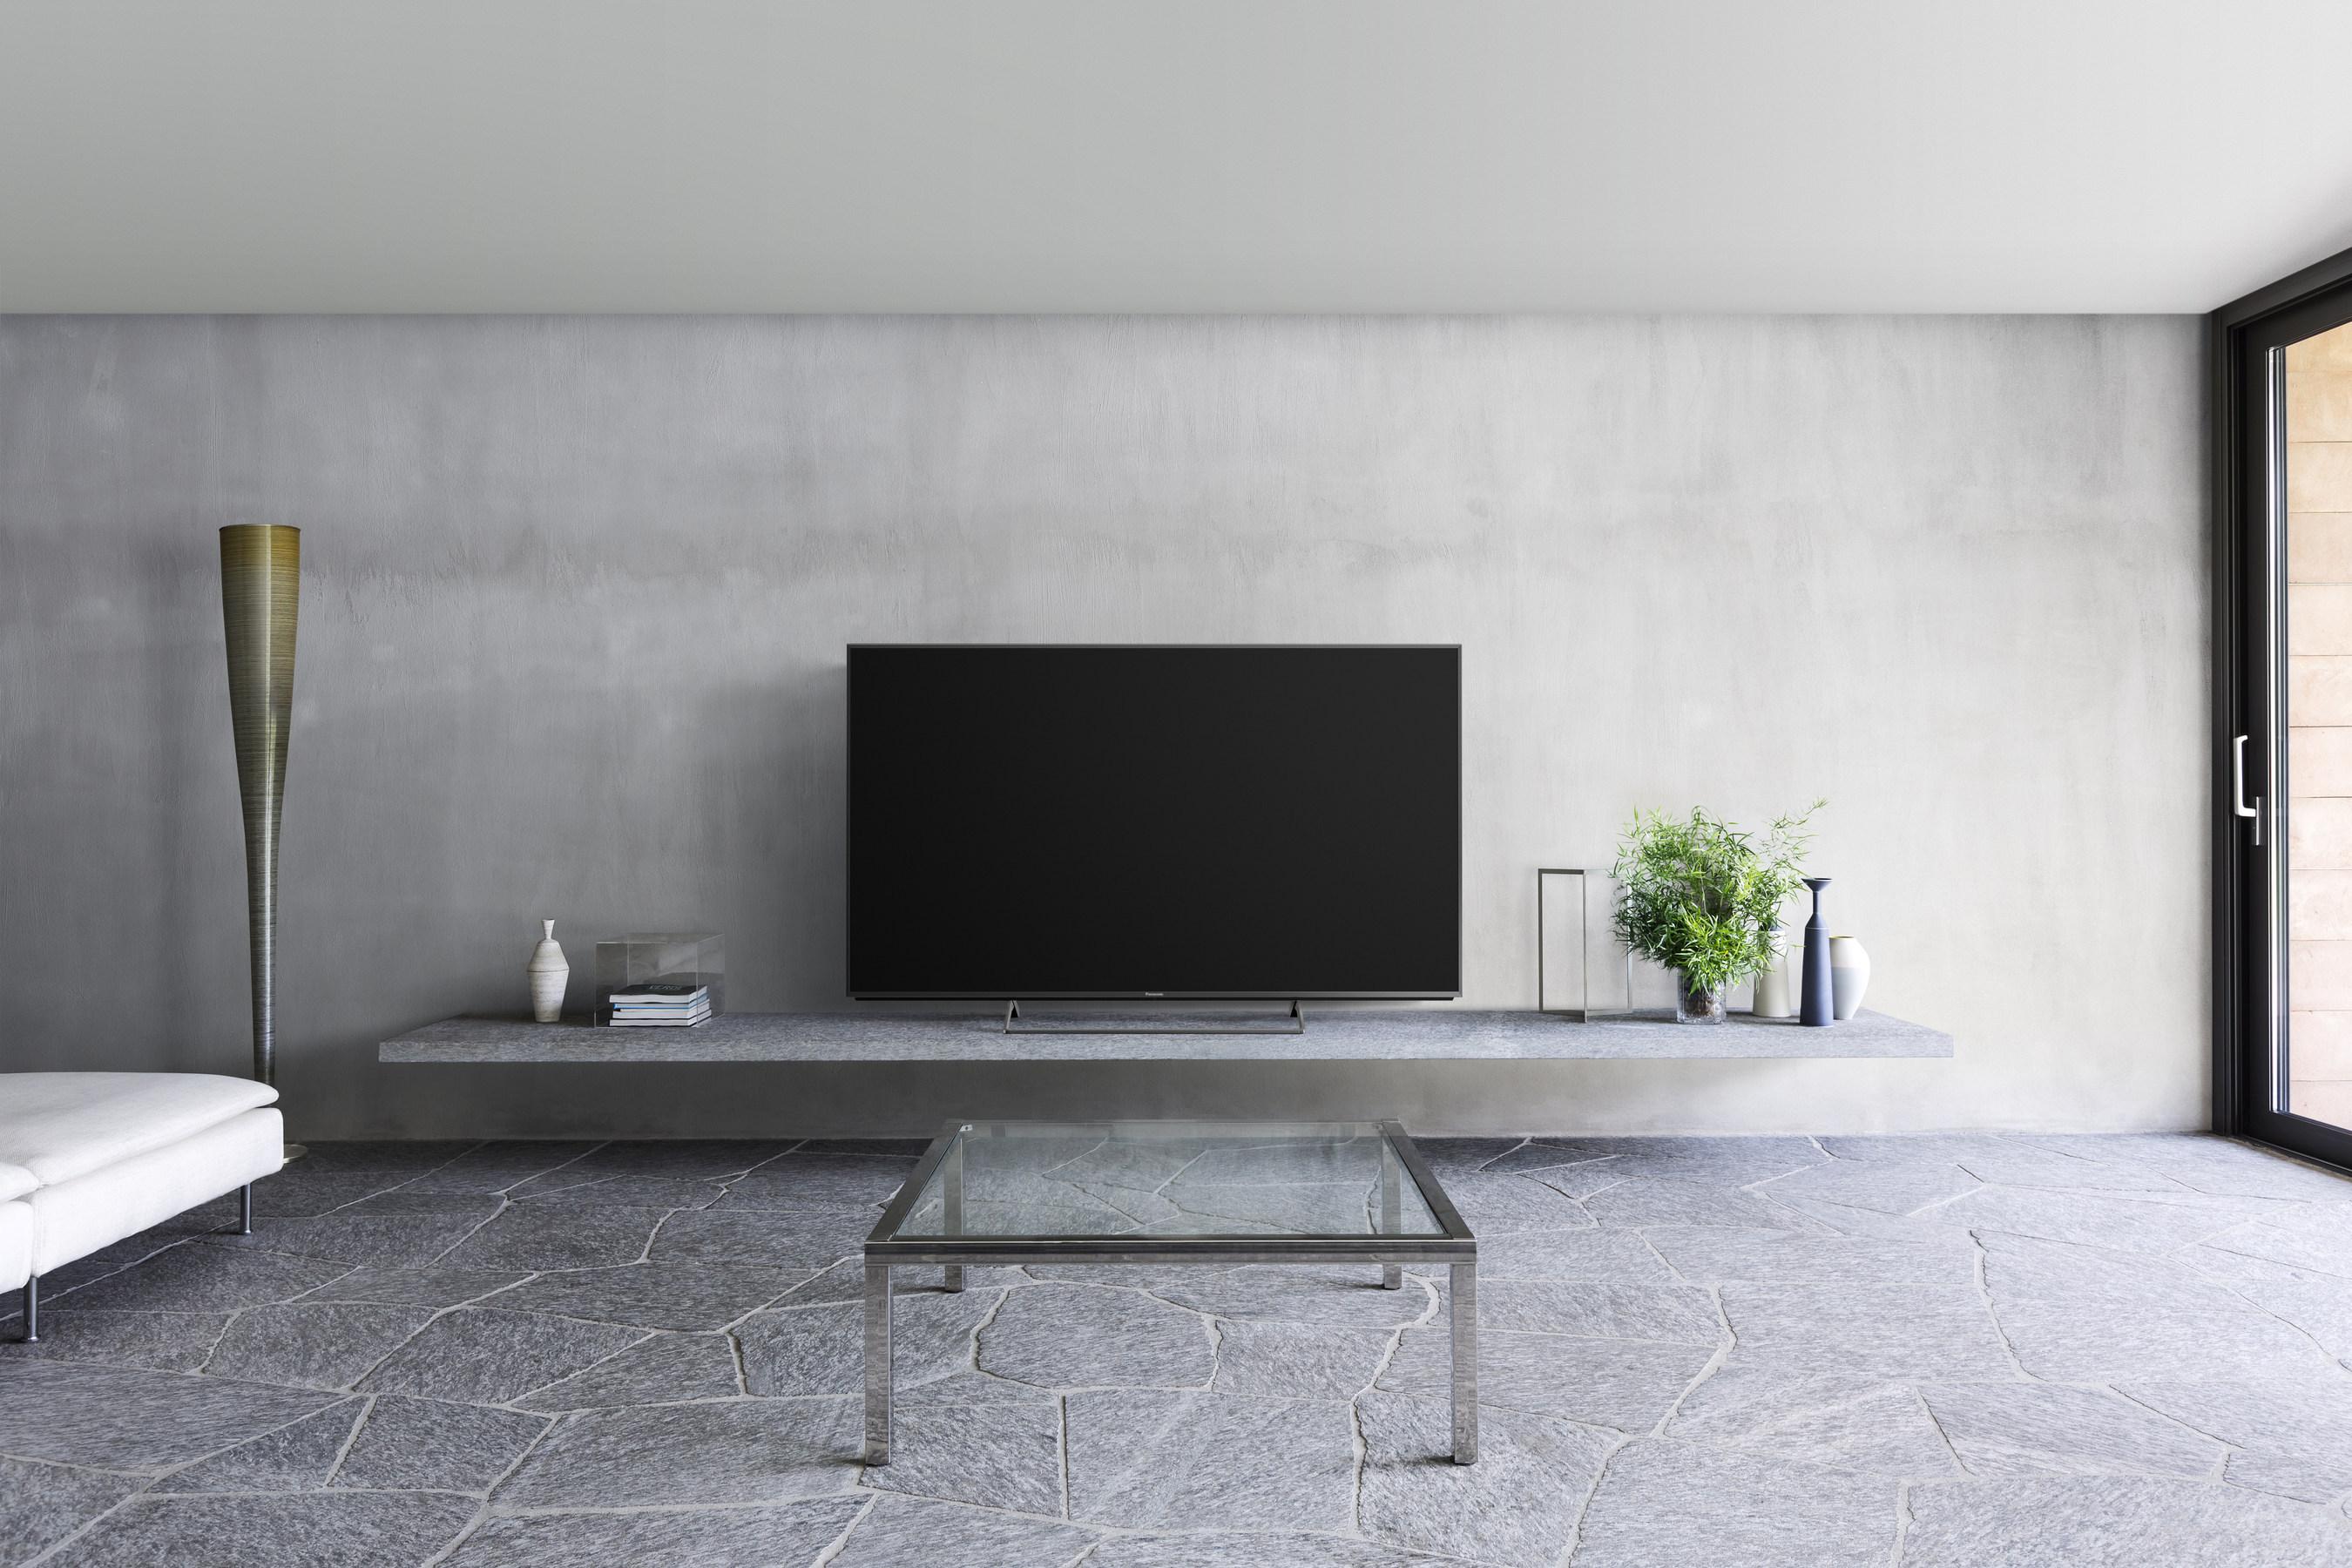 Panasonic Unveils Its CX850 Flagship 4K UHD TV Series